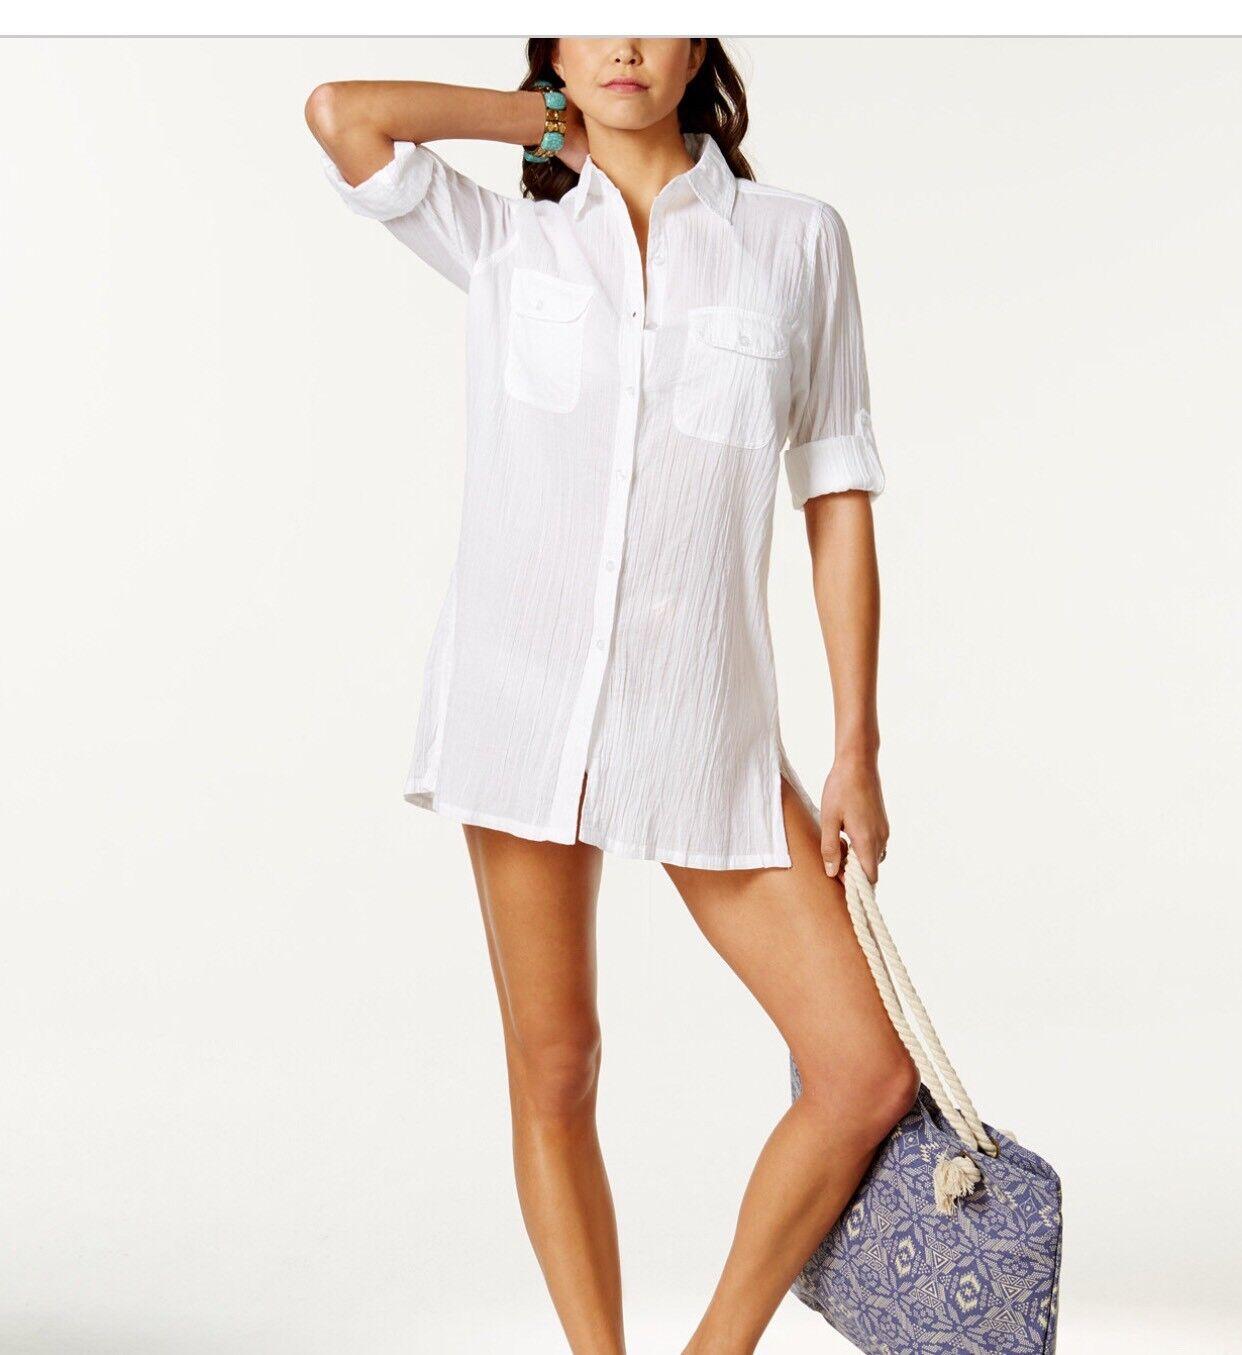 Polo Ralph Lauren Semi Sheer Tunic Cover Up Size M